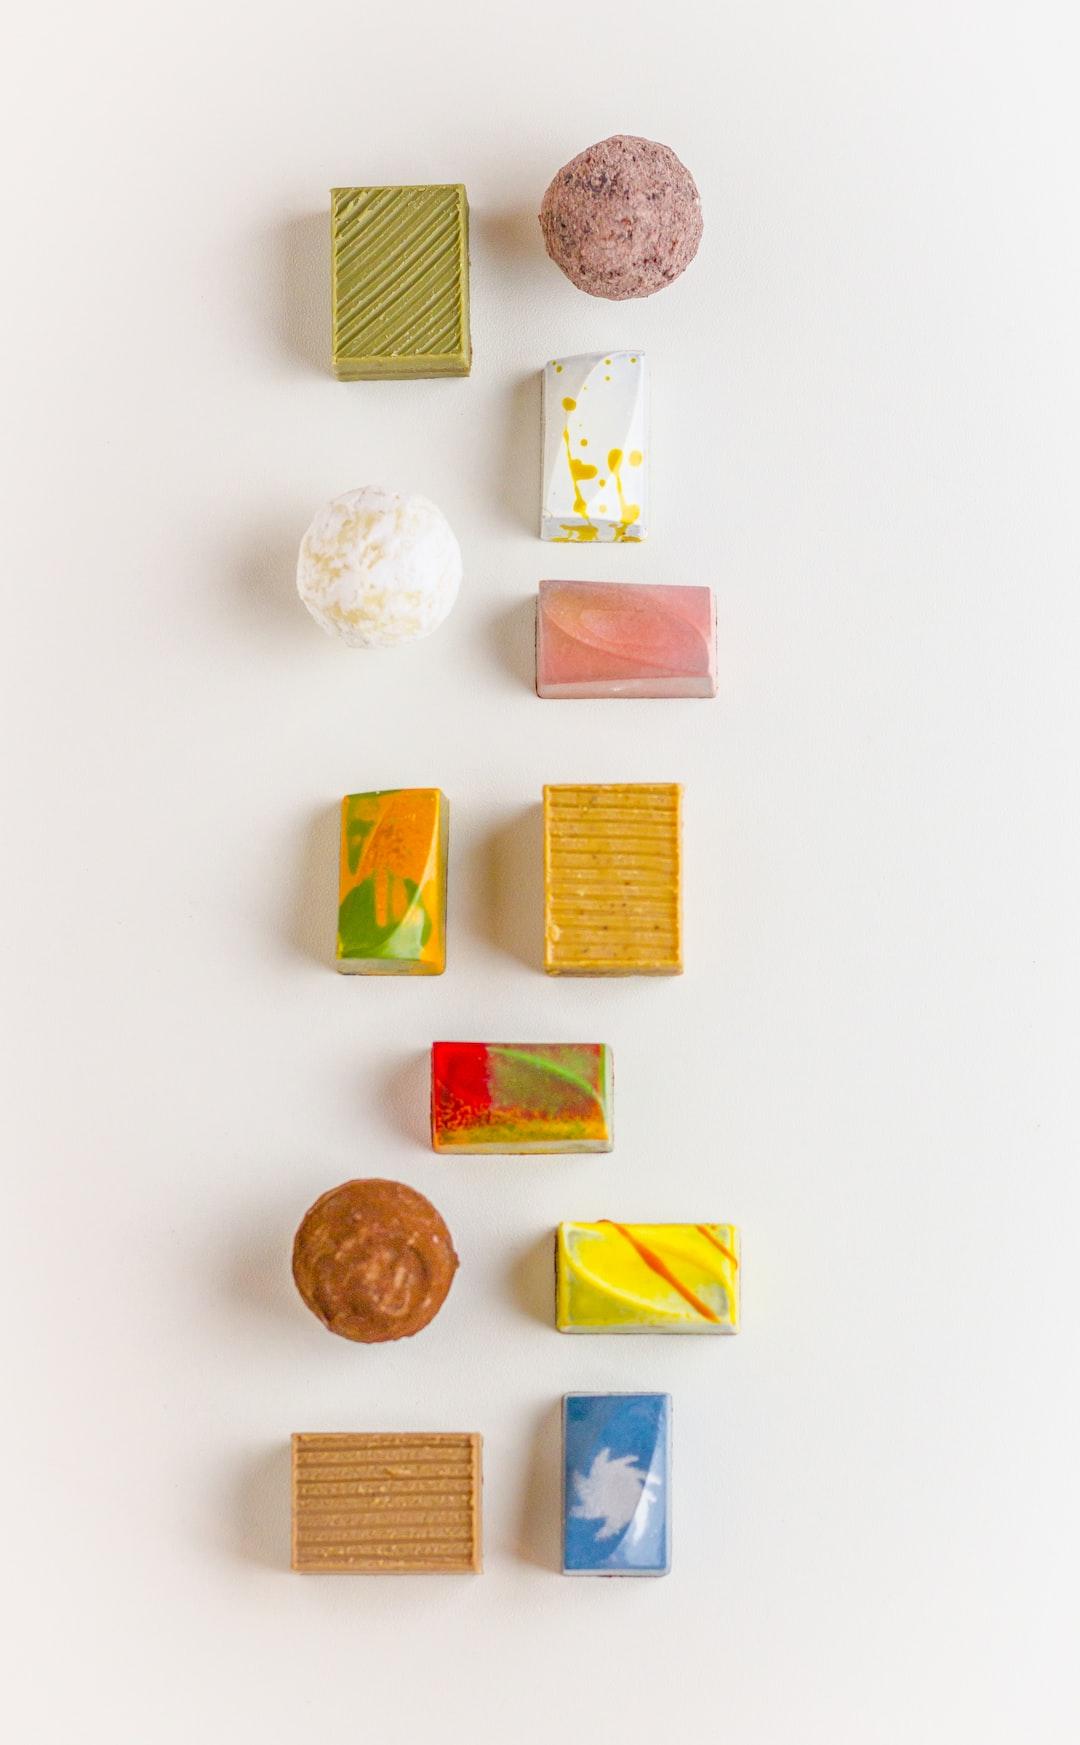 Chocolate bonbons mix